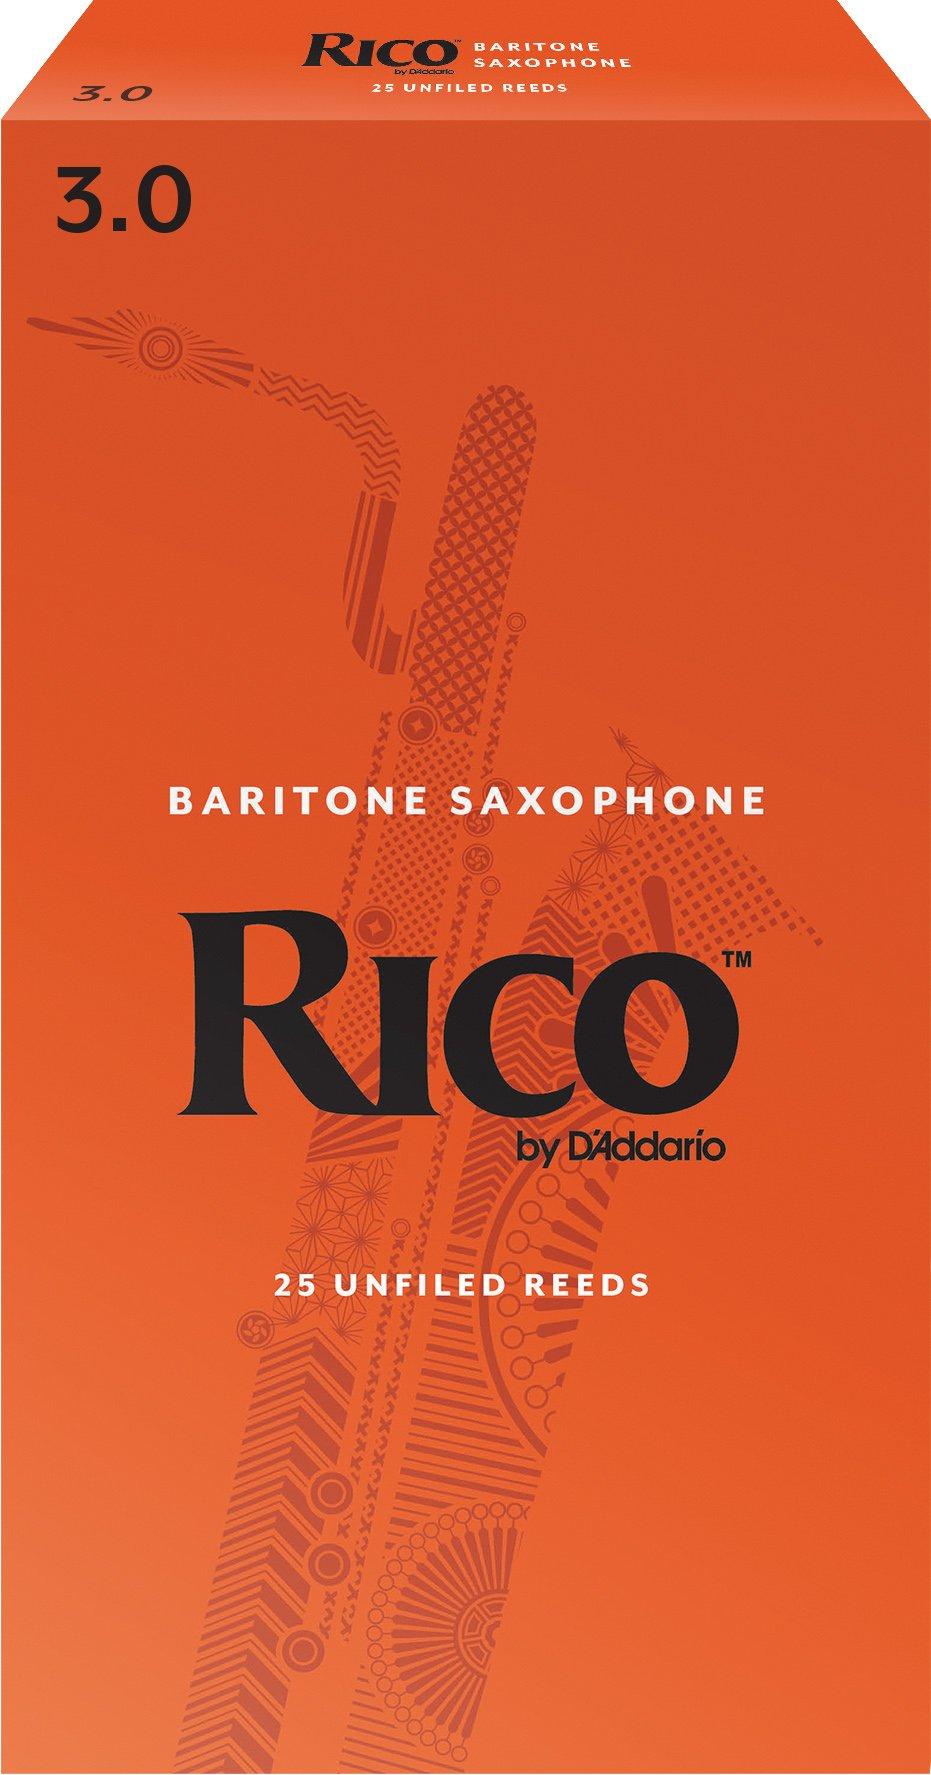 Rico by D'Addario Baritone Sax Reeds, Strength 3.0, 25-pack